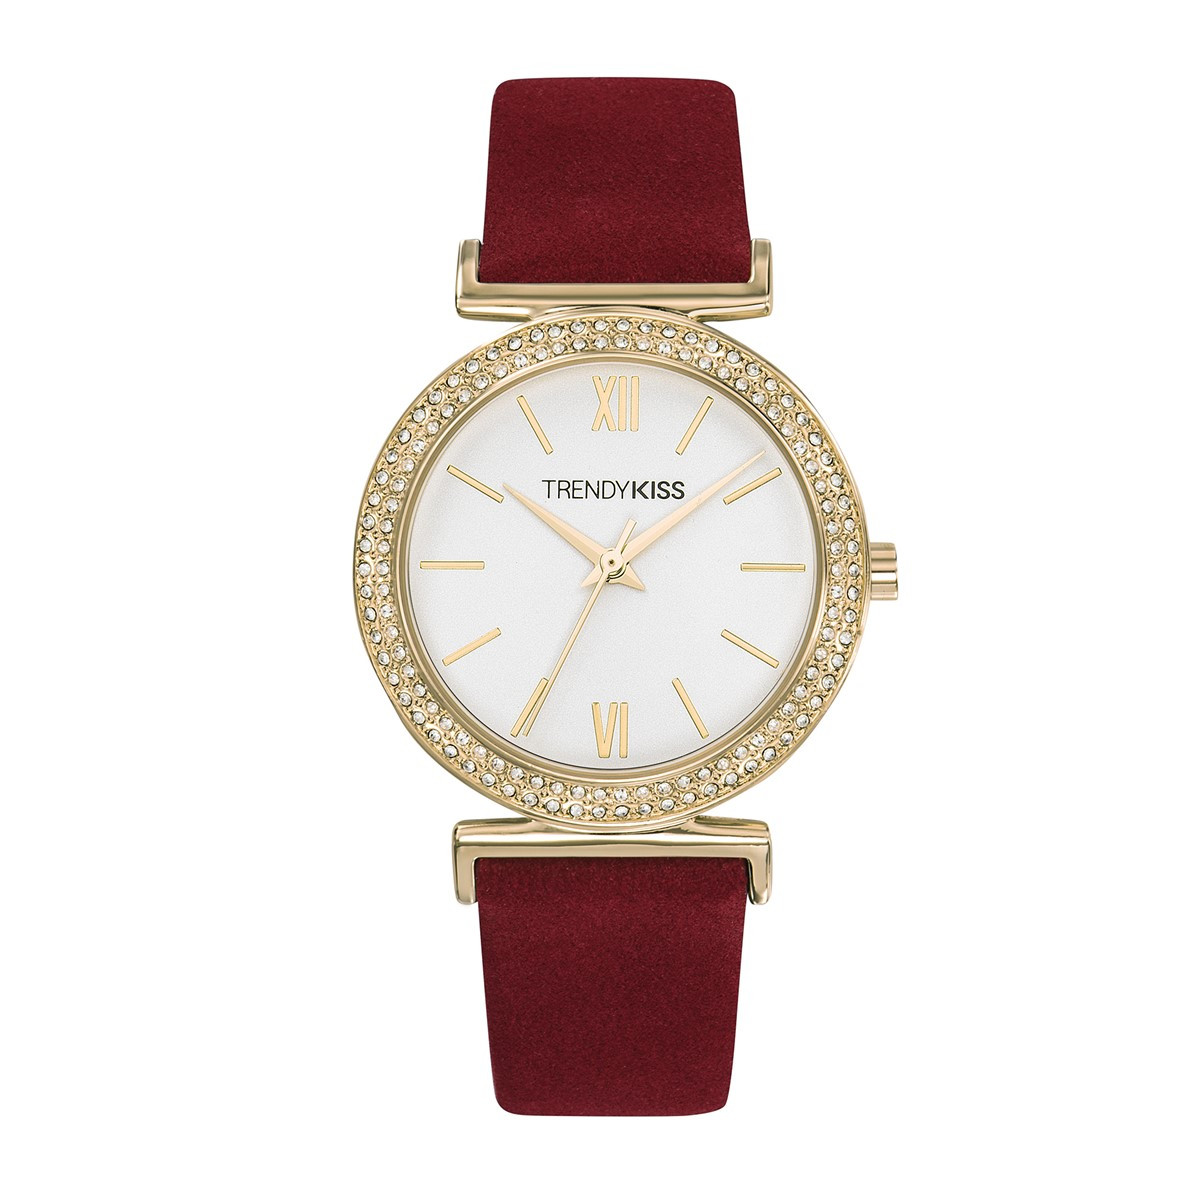 6998a55471 Montre femme Trendy Kiss Rose bracelet cuir véritable - Femme ...